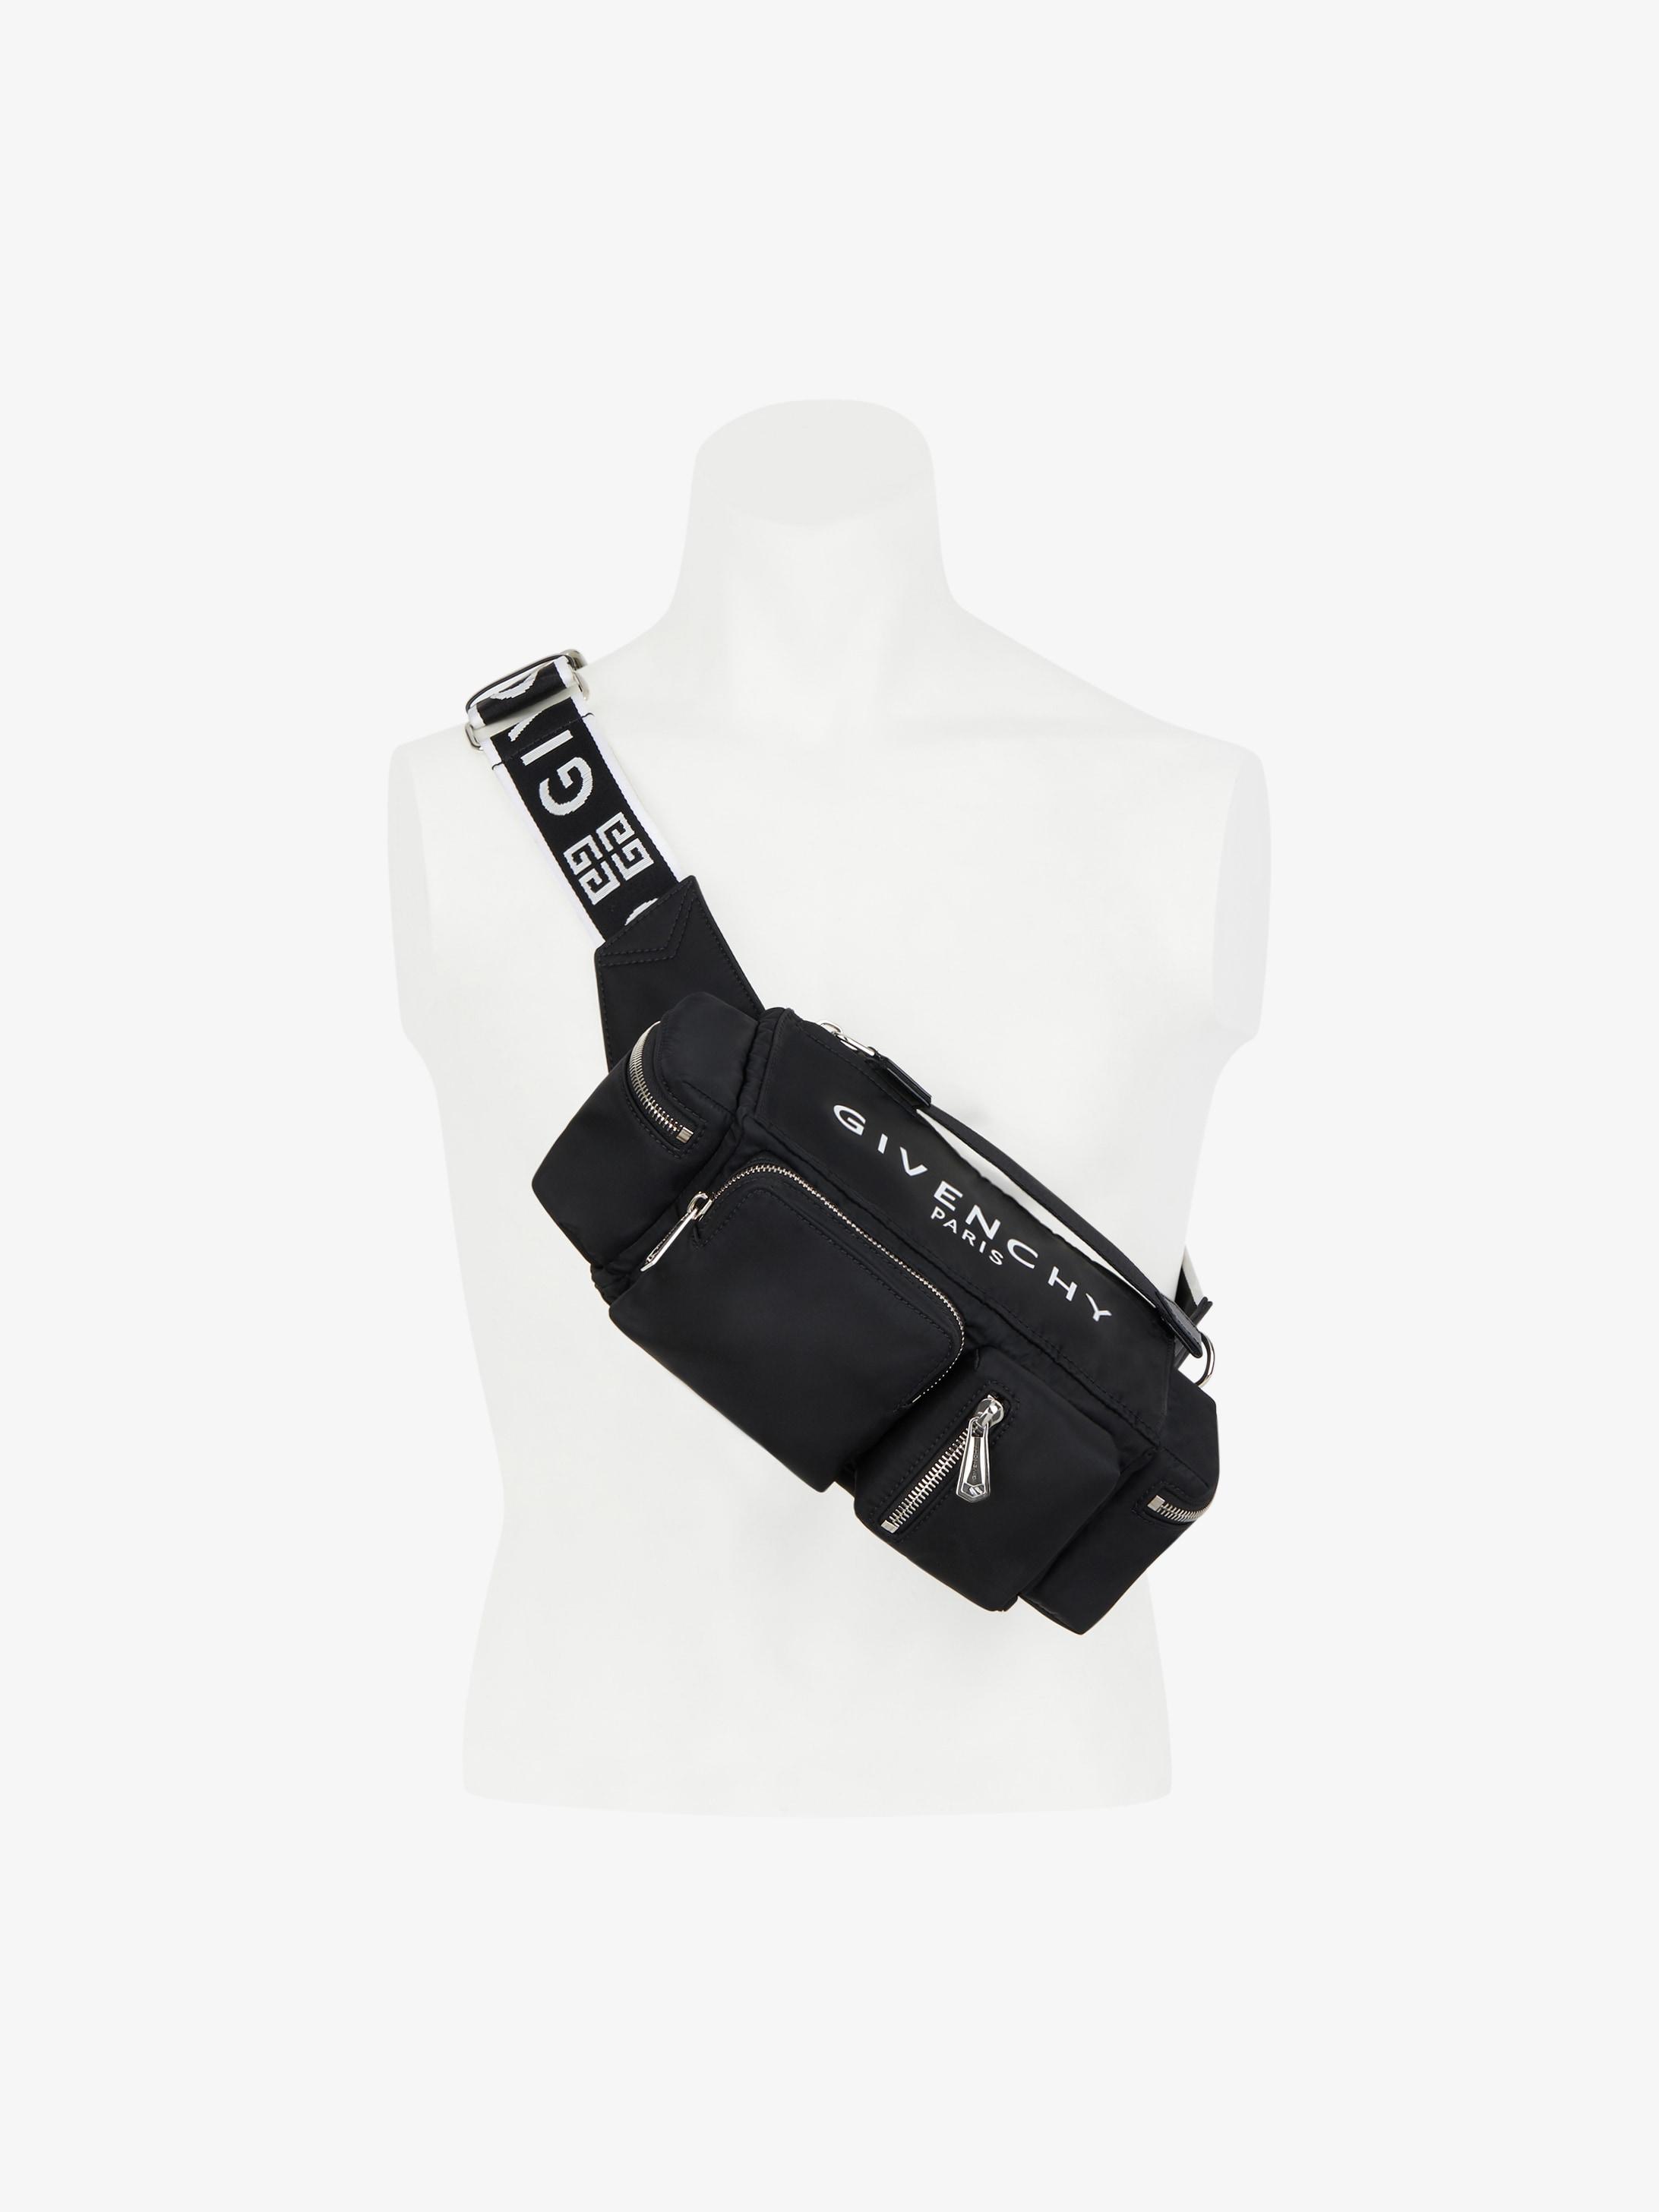 Pandora multipockets crossbody bag  in nylon